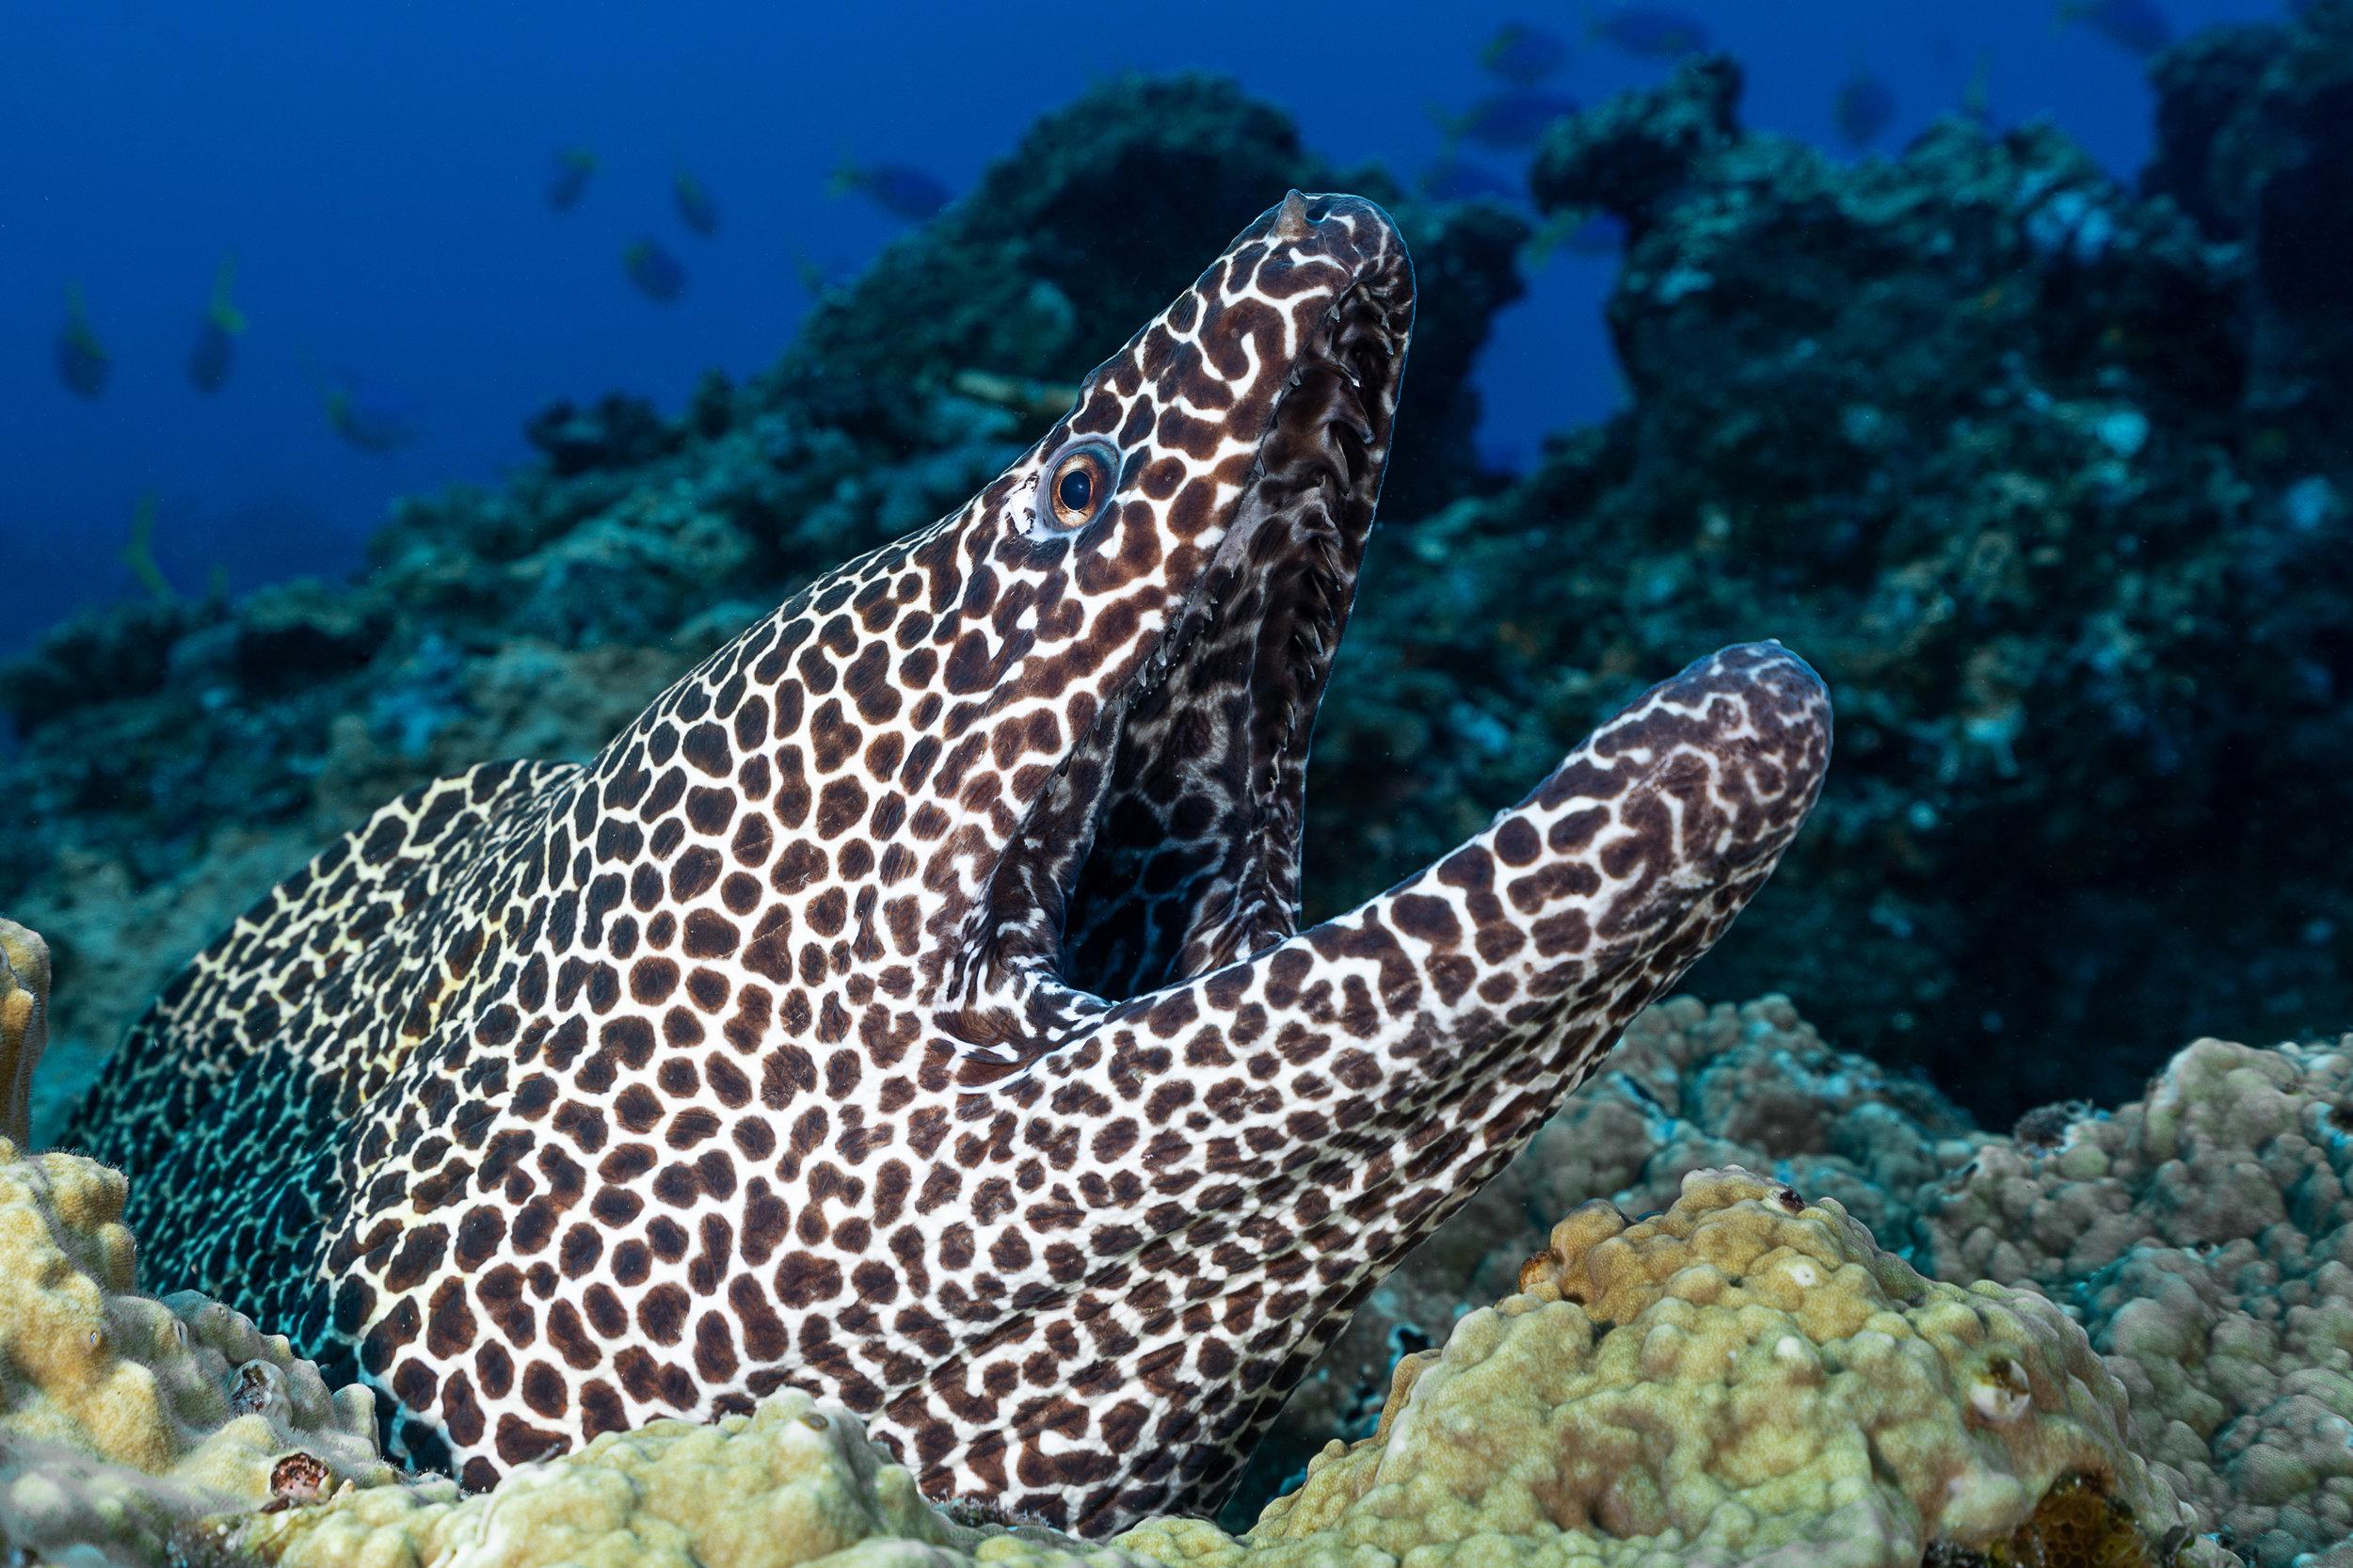 moray eel credit: François Baelen / coral reef image bank